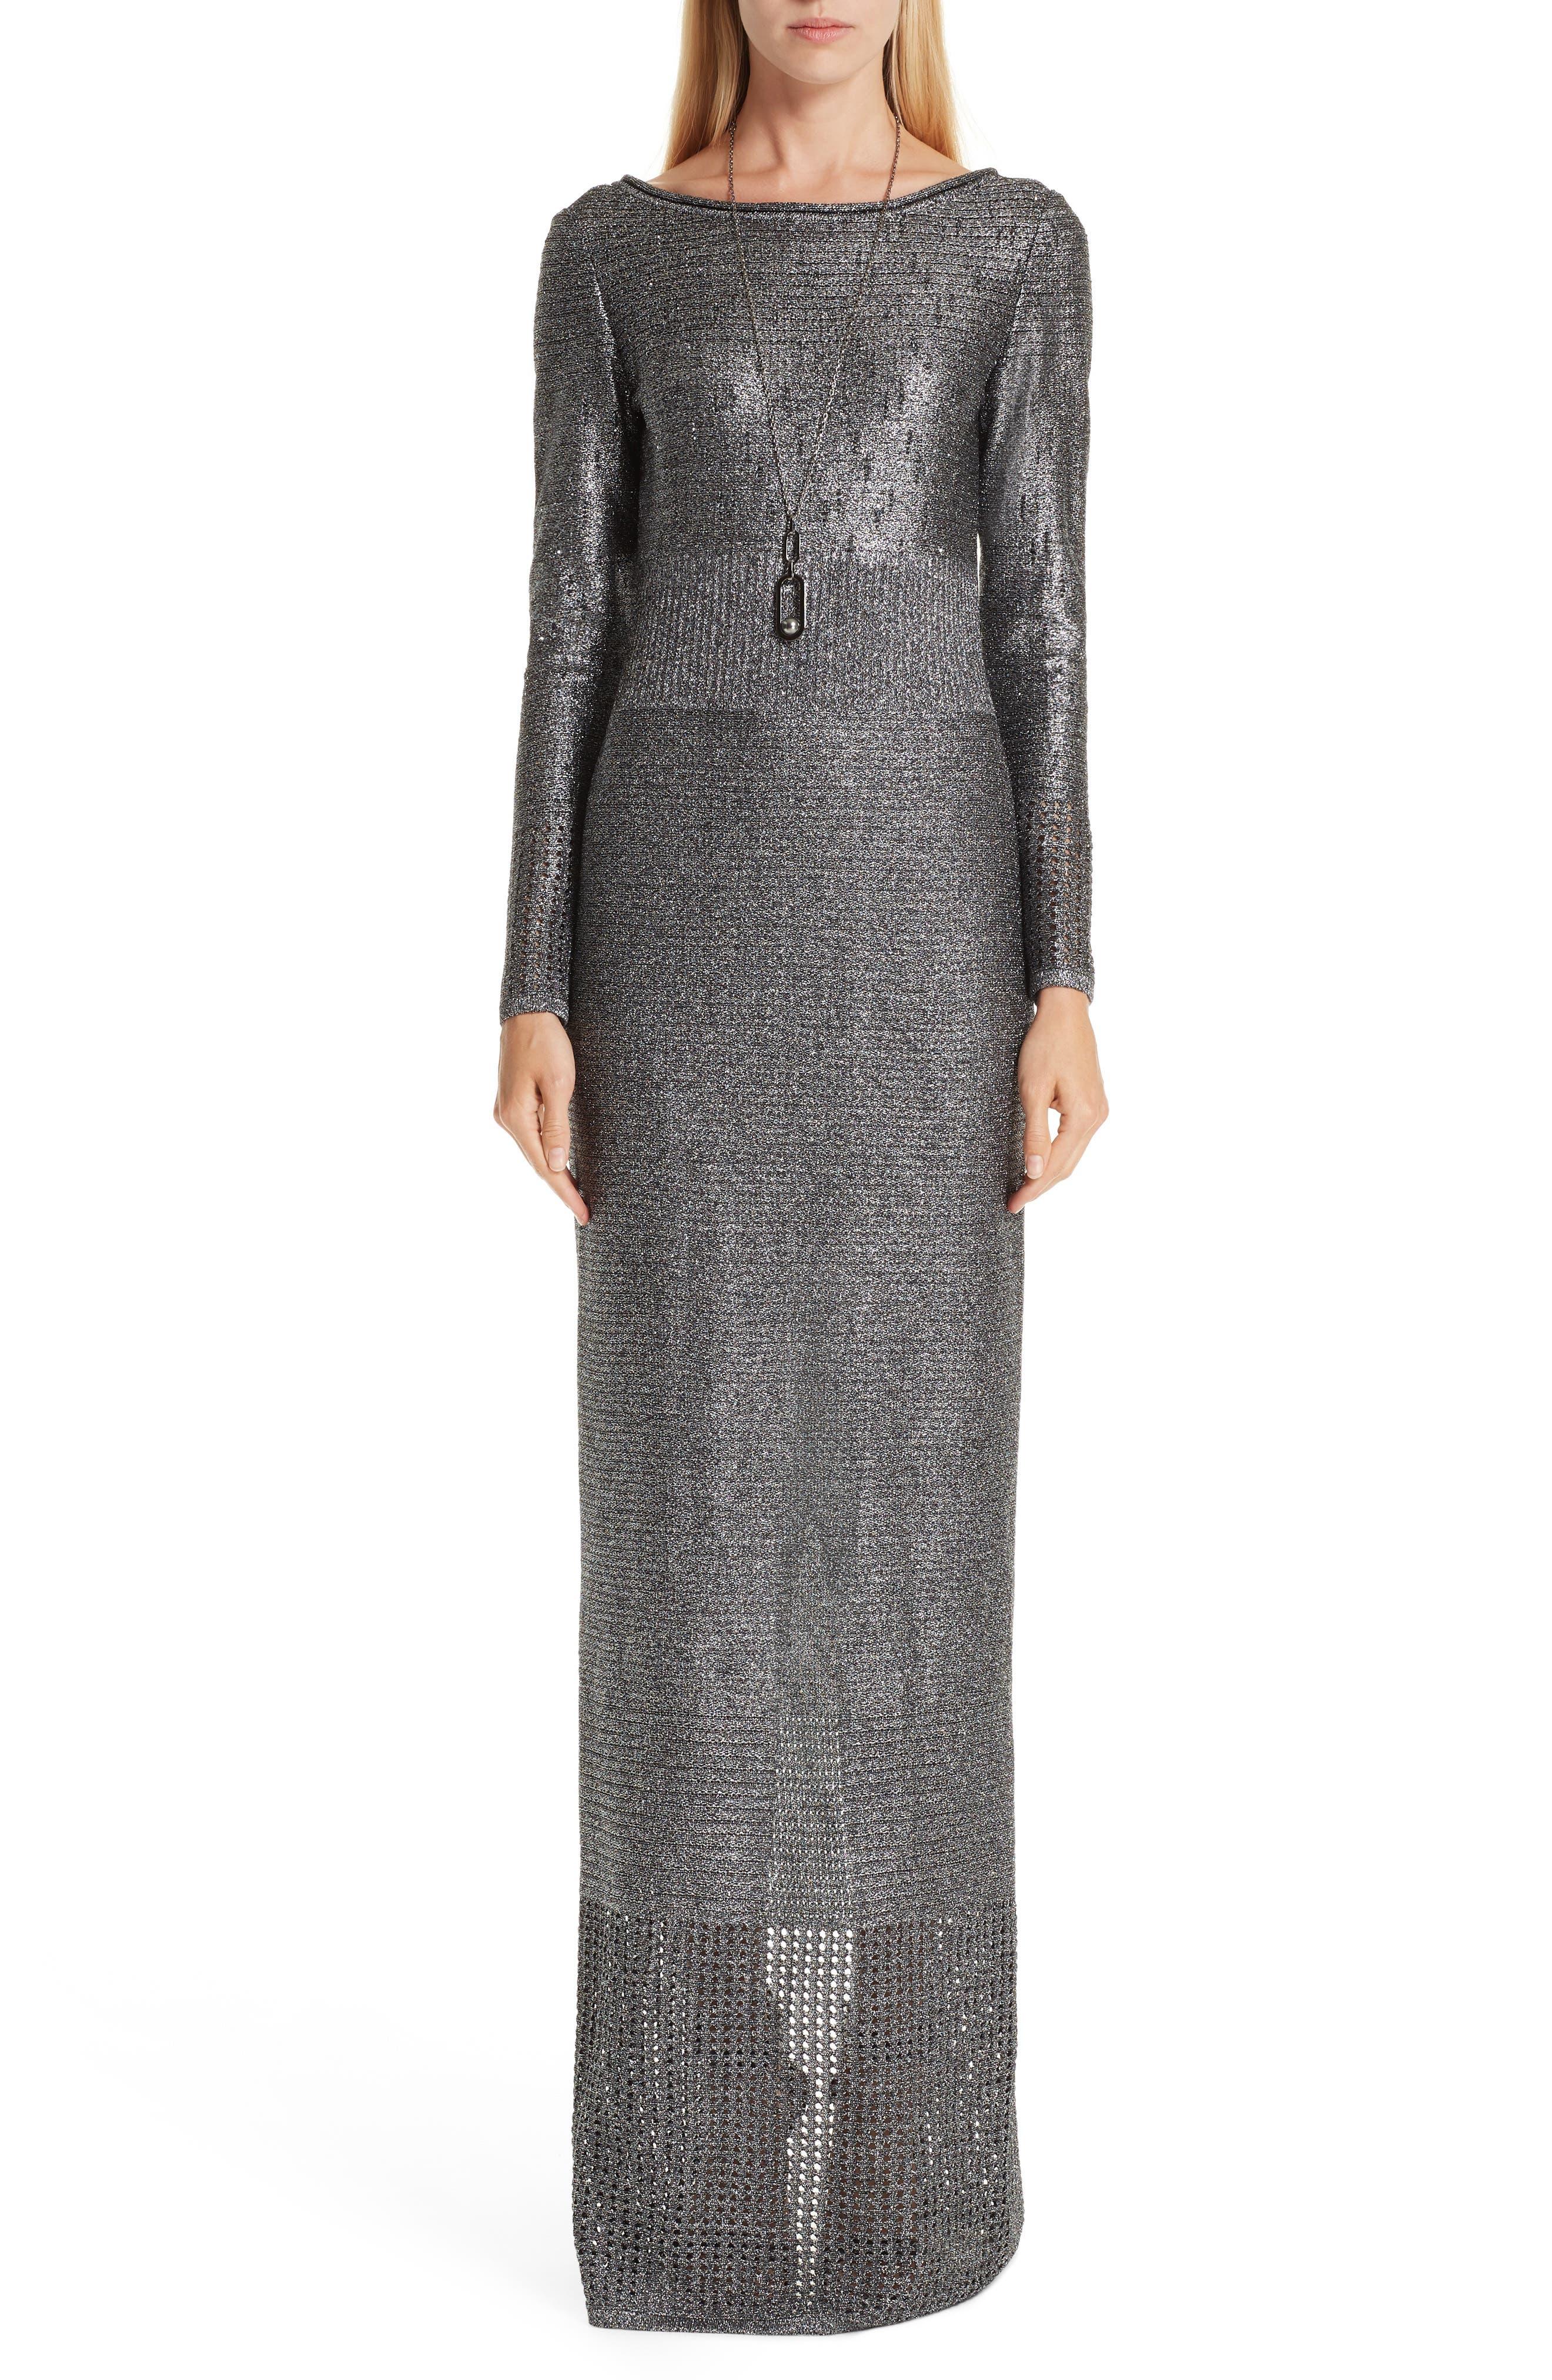 ST. JOHN COLLECTION Metallic Plaited Mixed Knit Gown, Main, color, GUNMETAL/ CAVIAR